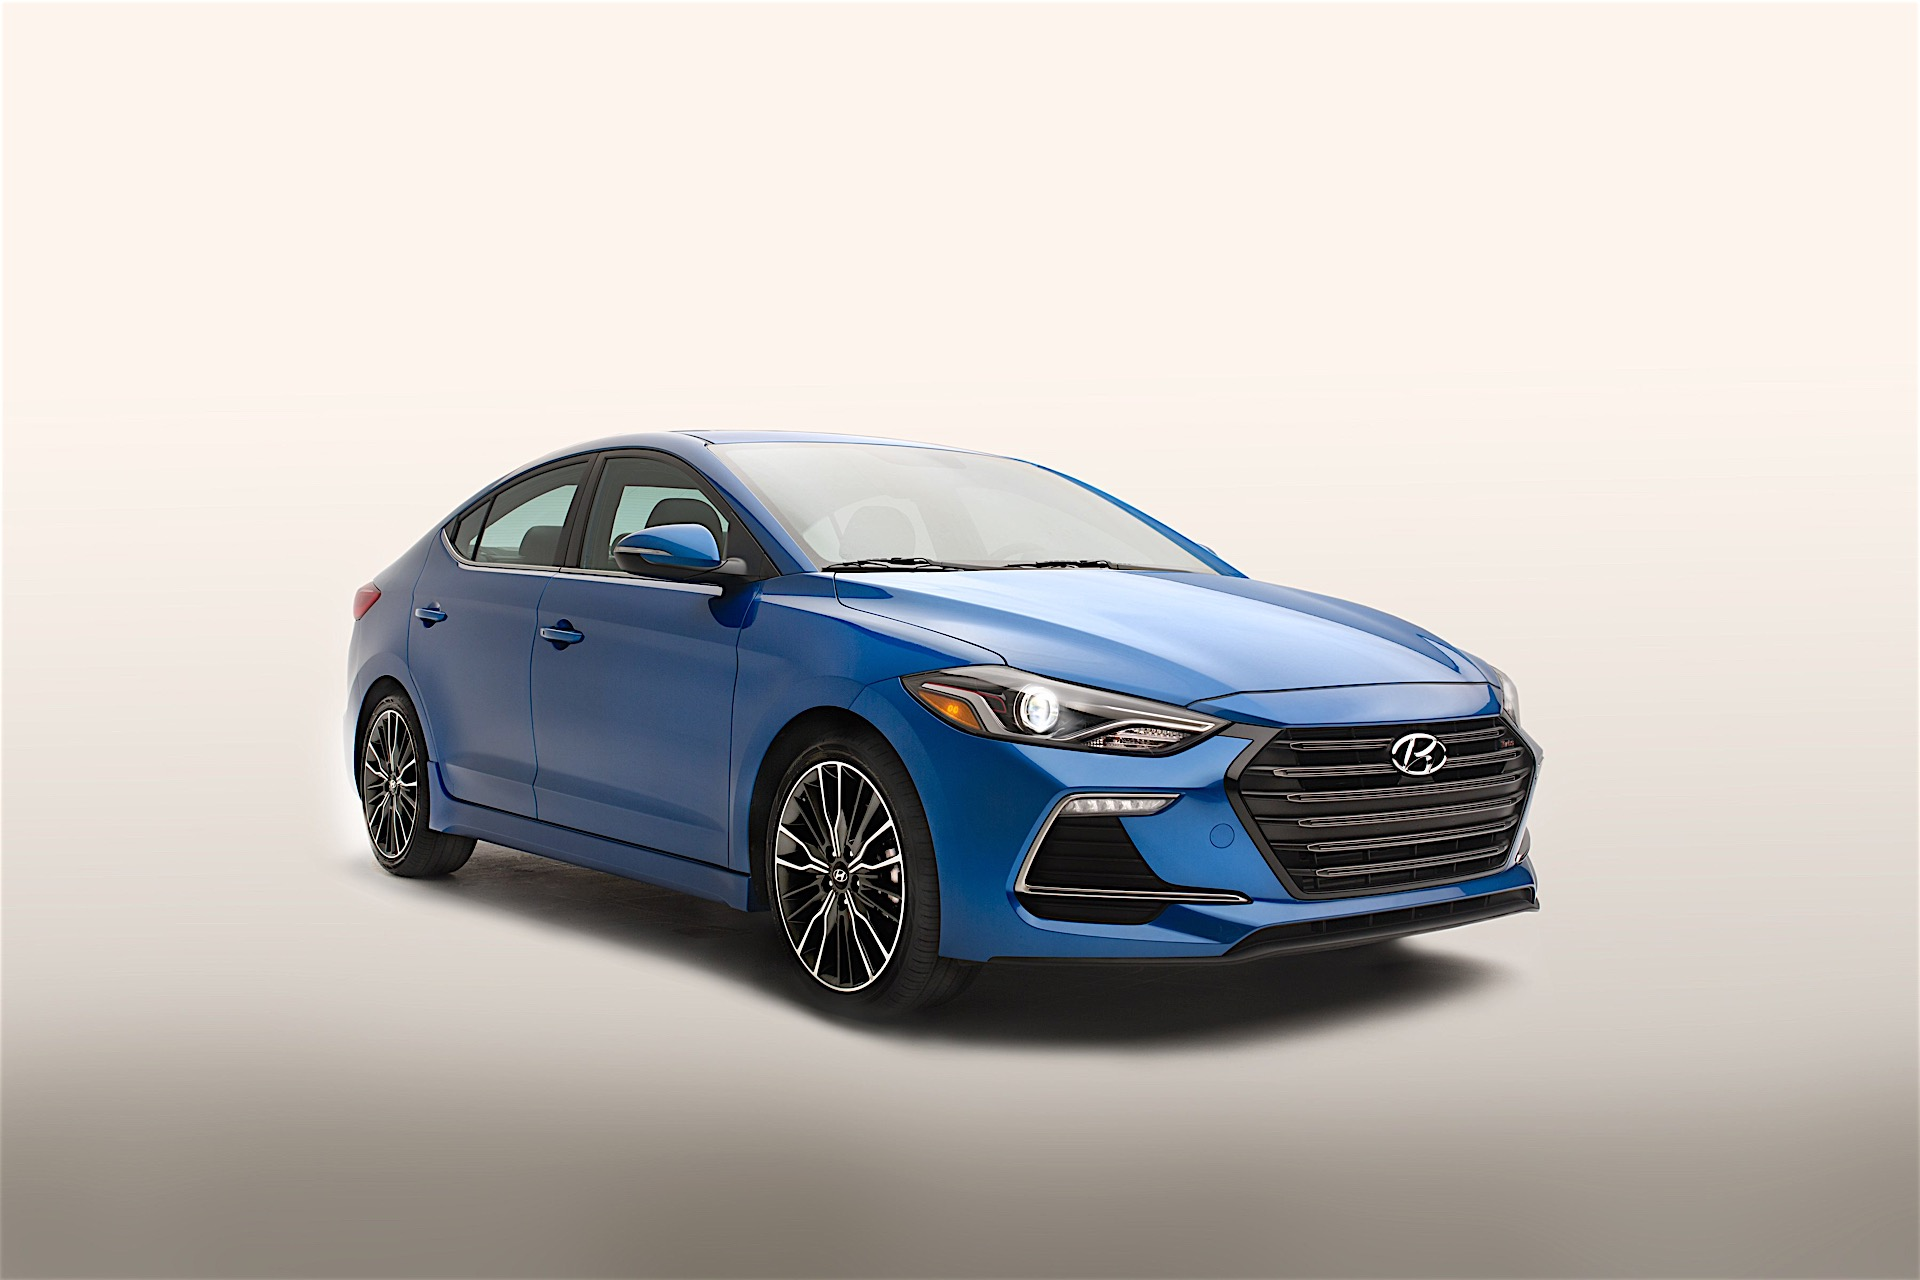 2017 Hyundai Elantra Sport Revealed Becomes Most Powerful